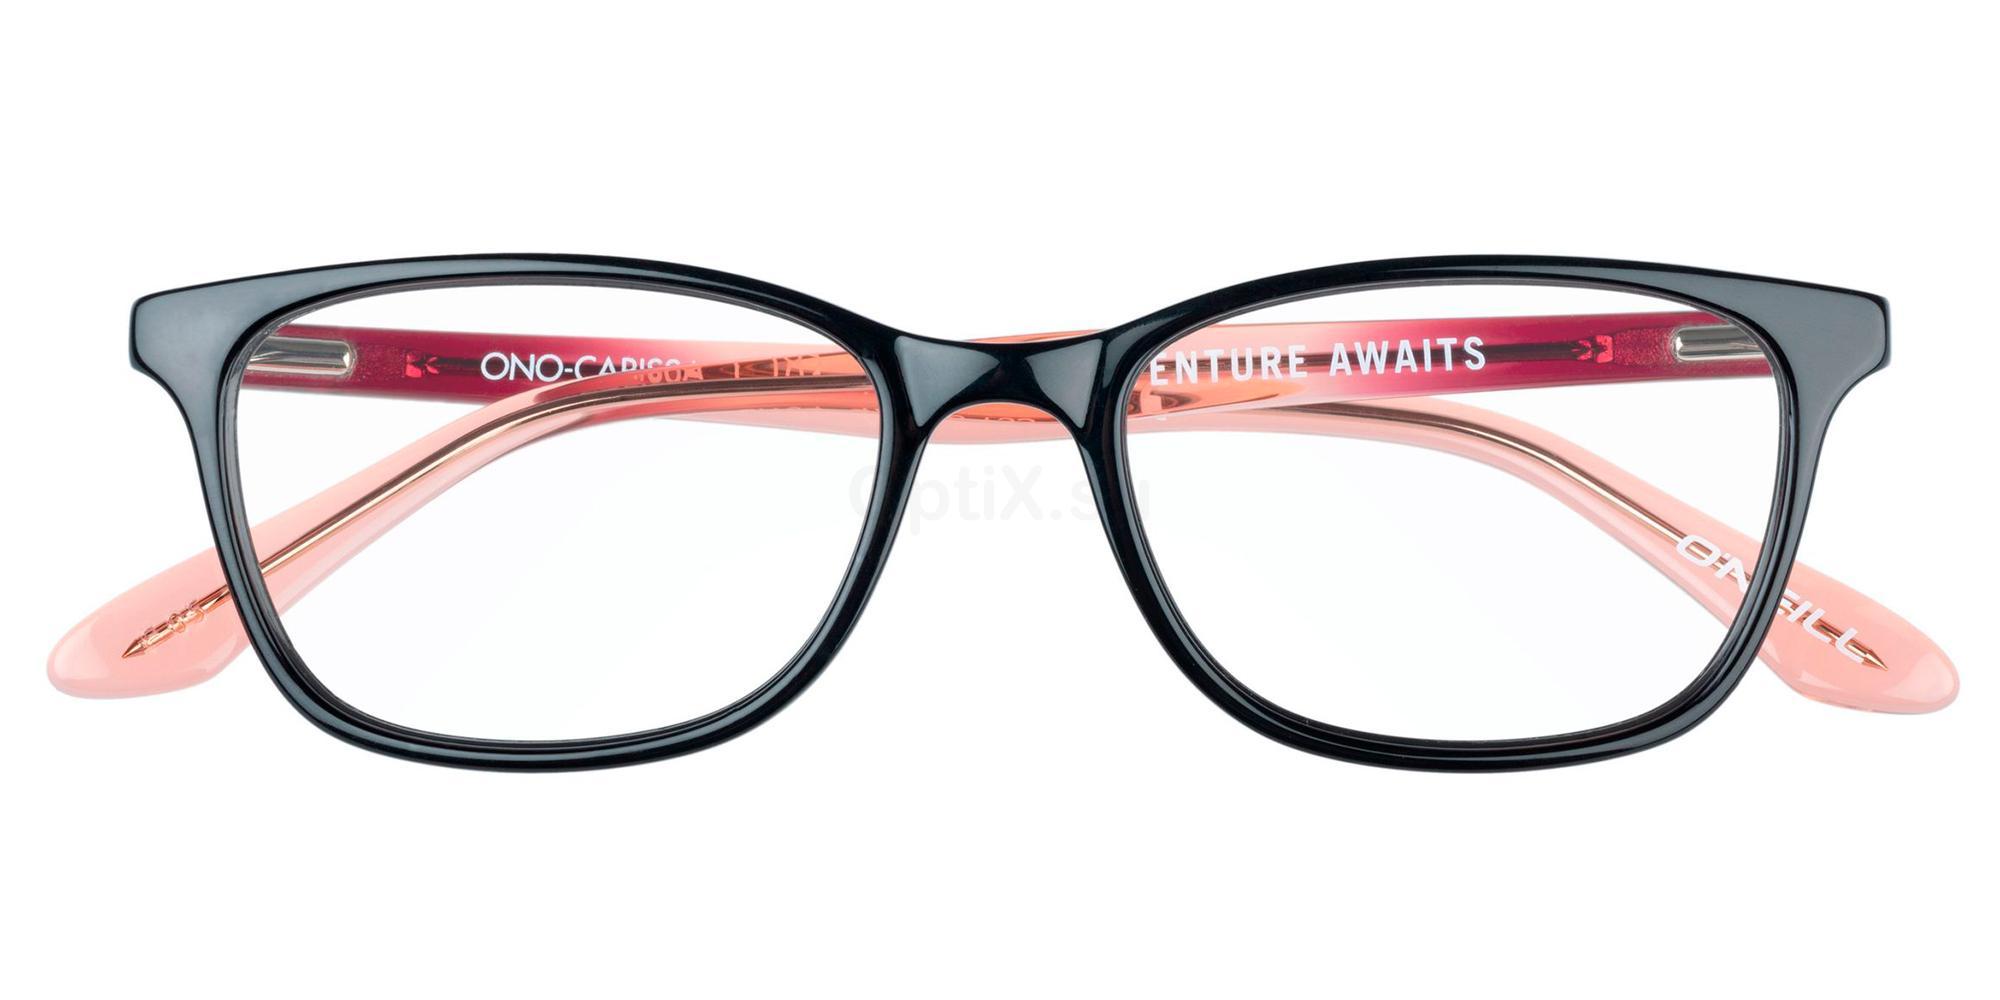 104 ONO-CARISSA Glasses, O'Neill